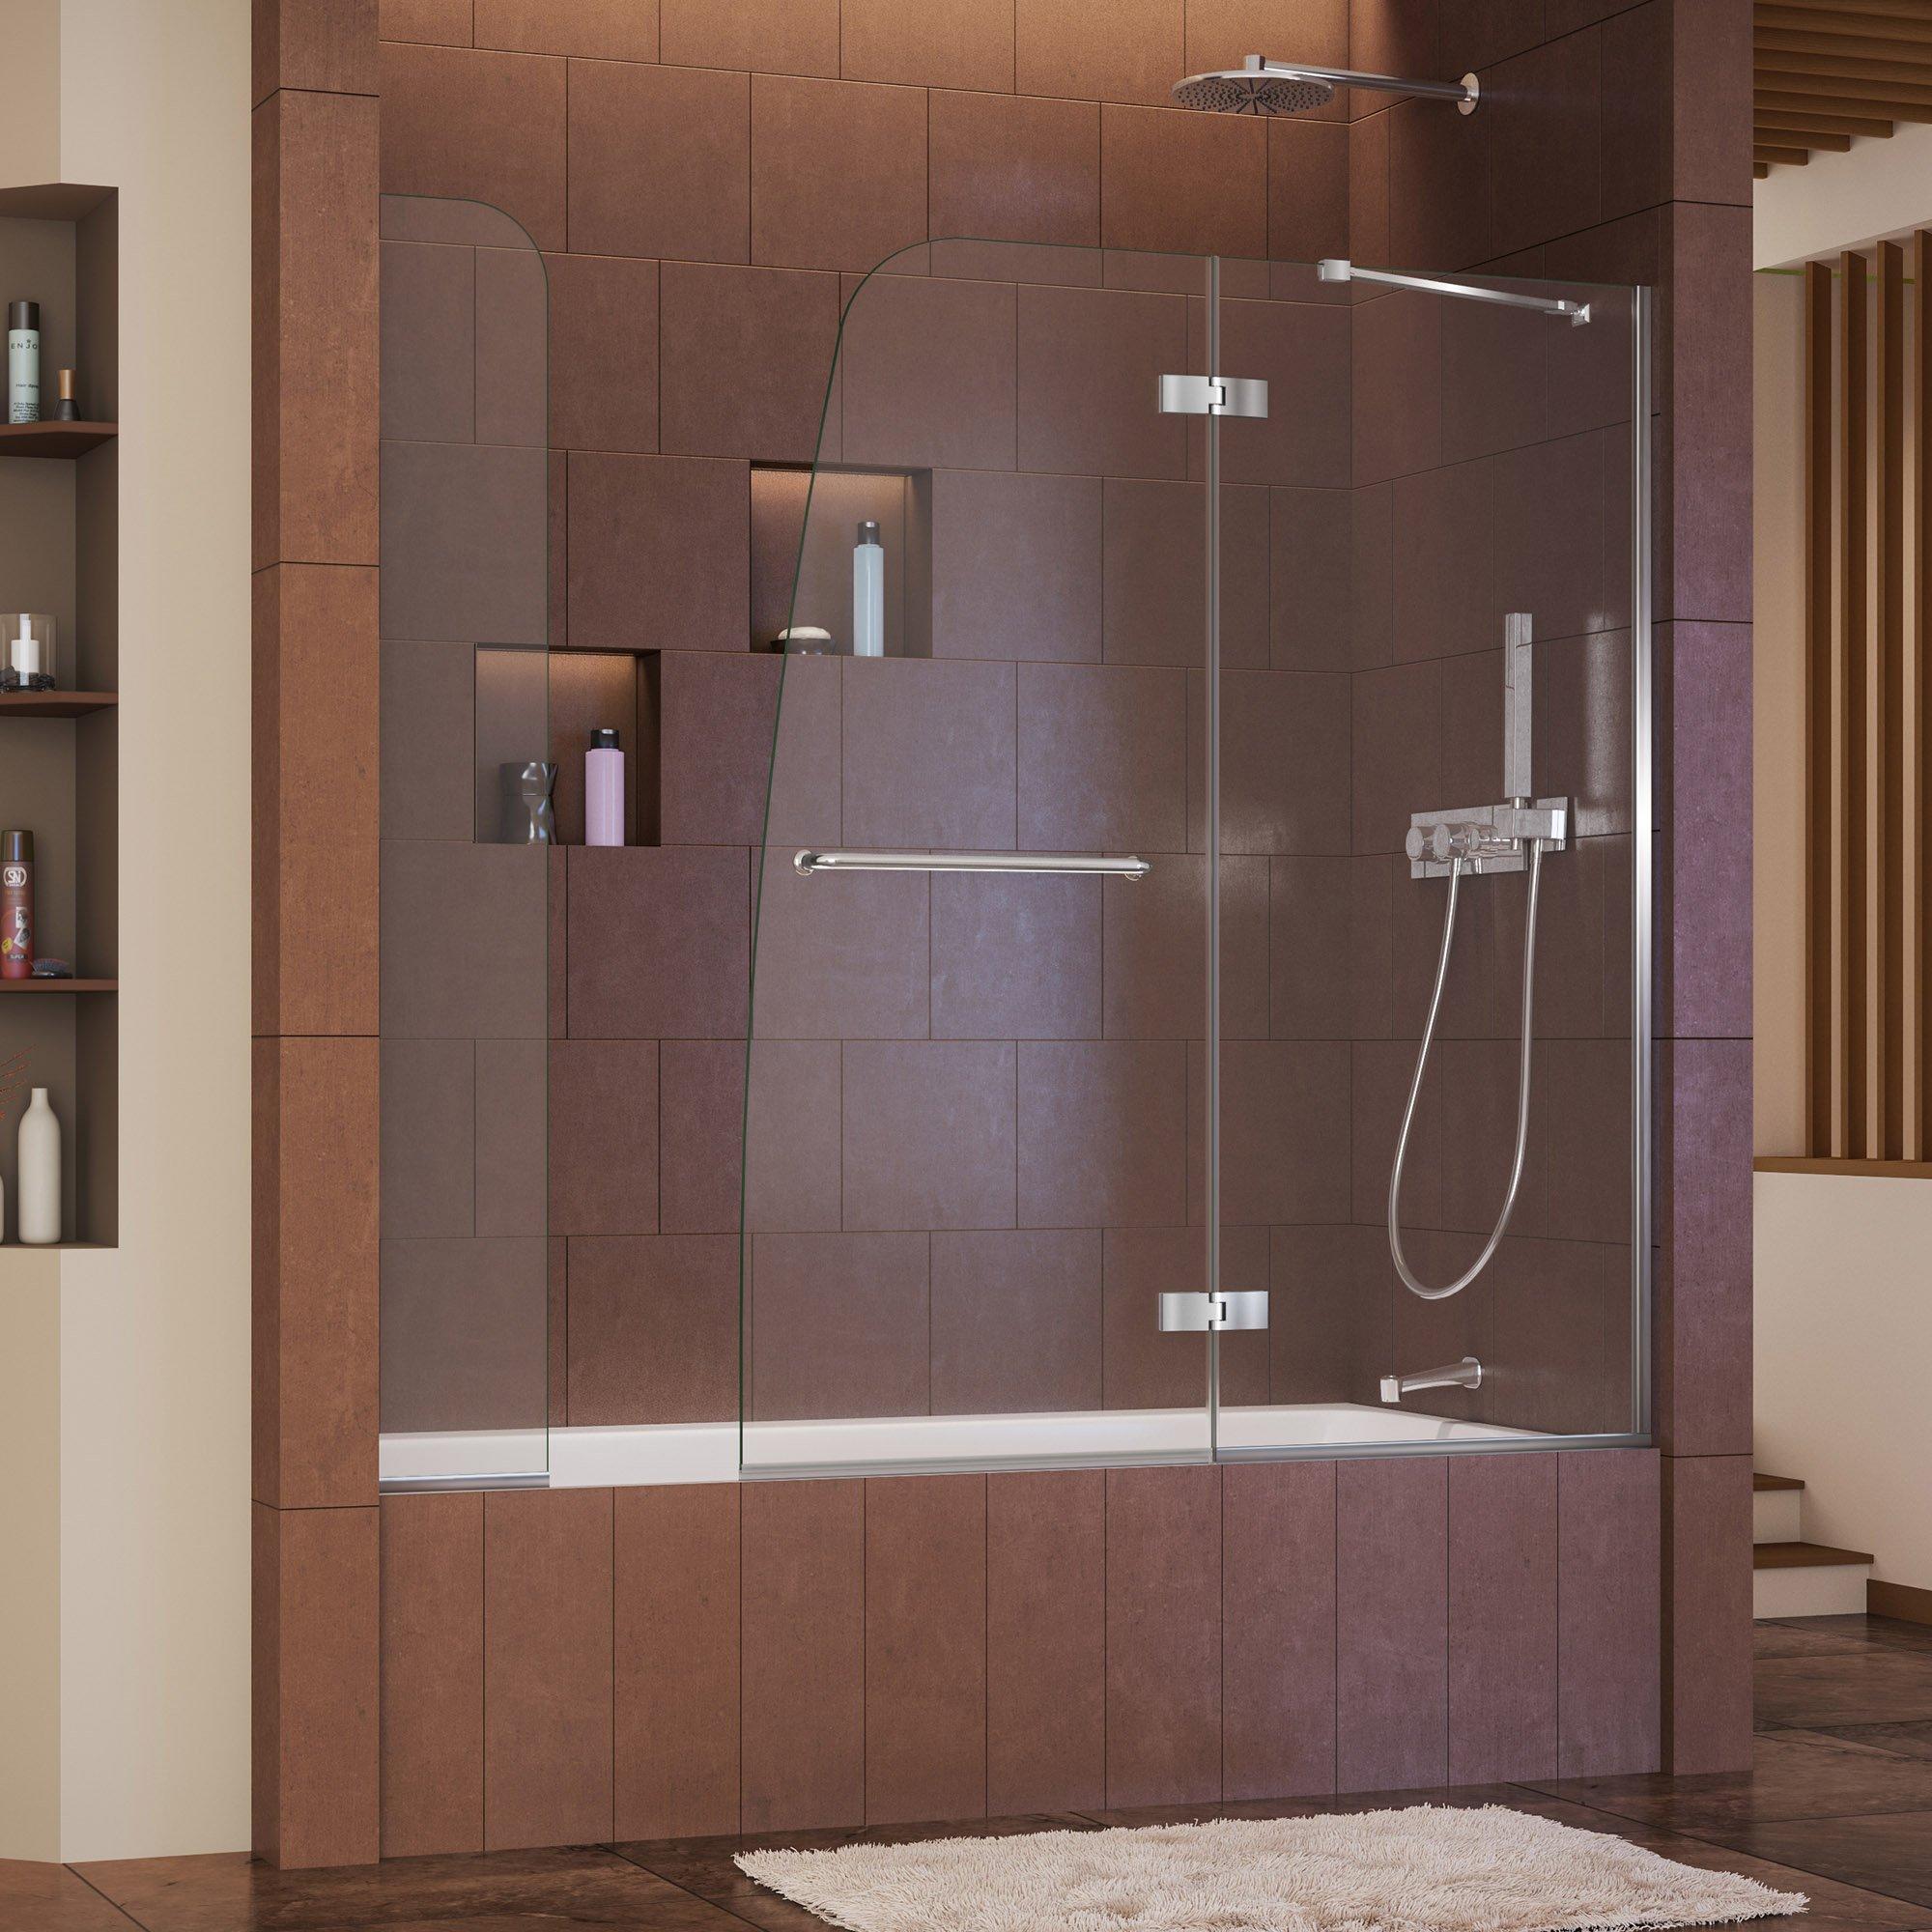 DreamLine Aqua Ultra 57-60 in. Width, Frameless Hinged Tub Door, 5/16'' Glass, Chrome Finish